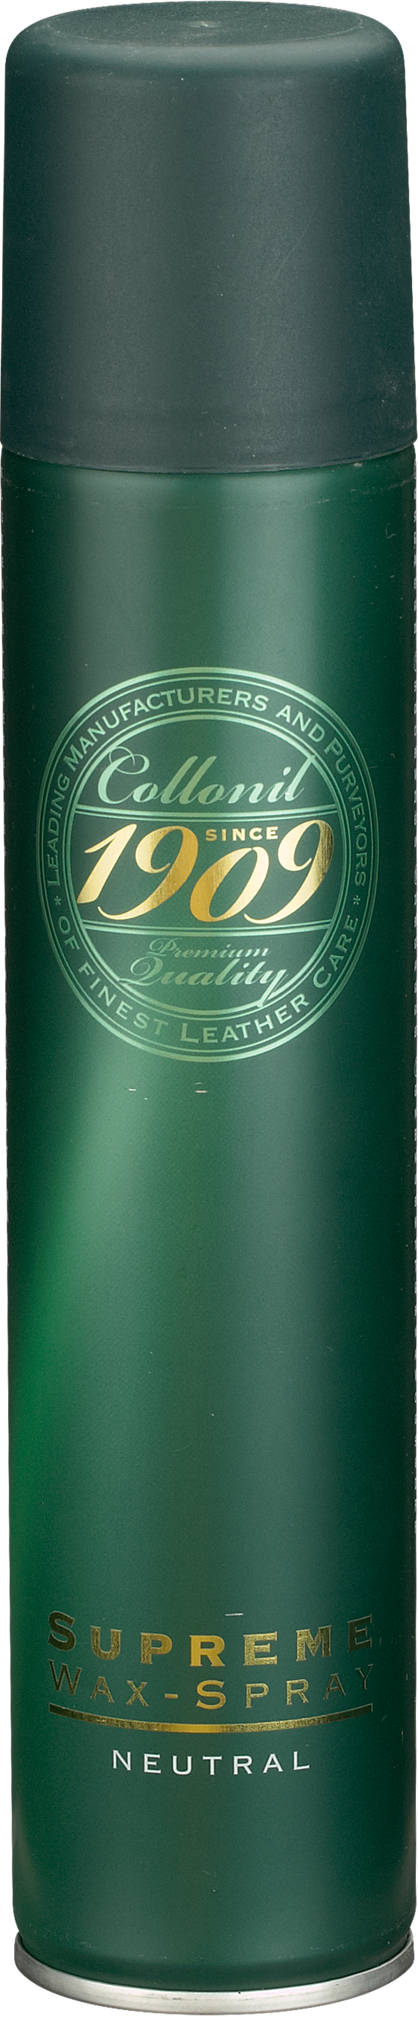 Collonil 1909 SUPREME WAX SPRAY - 200 ml (6,48 € / 100 ml)